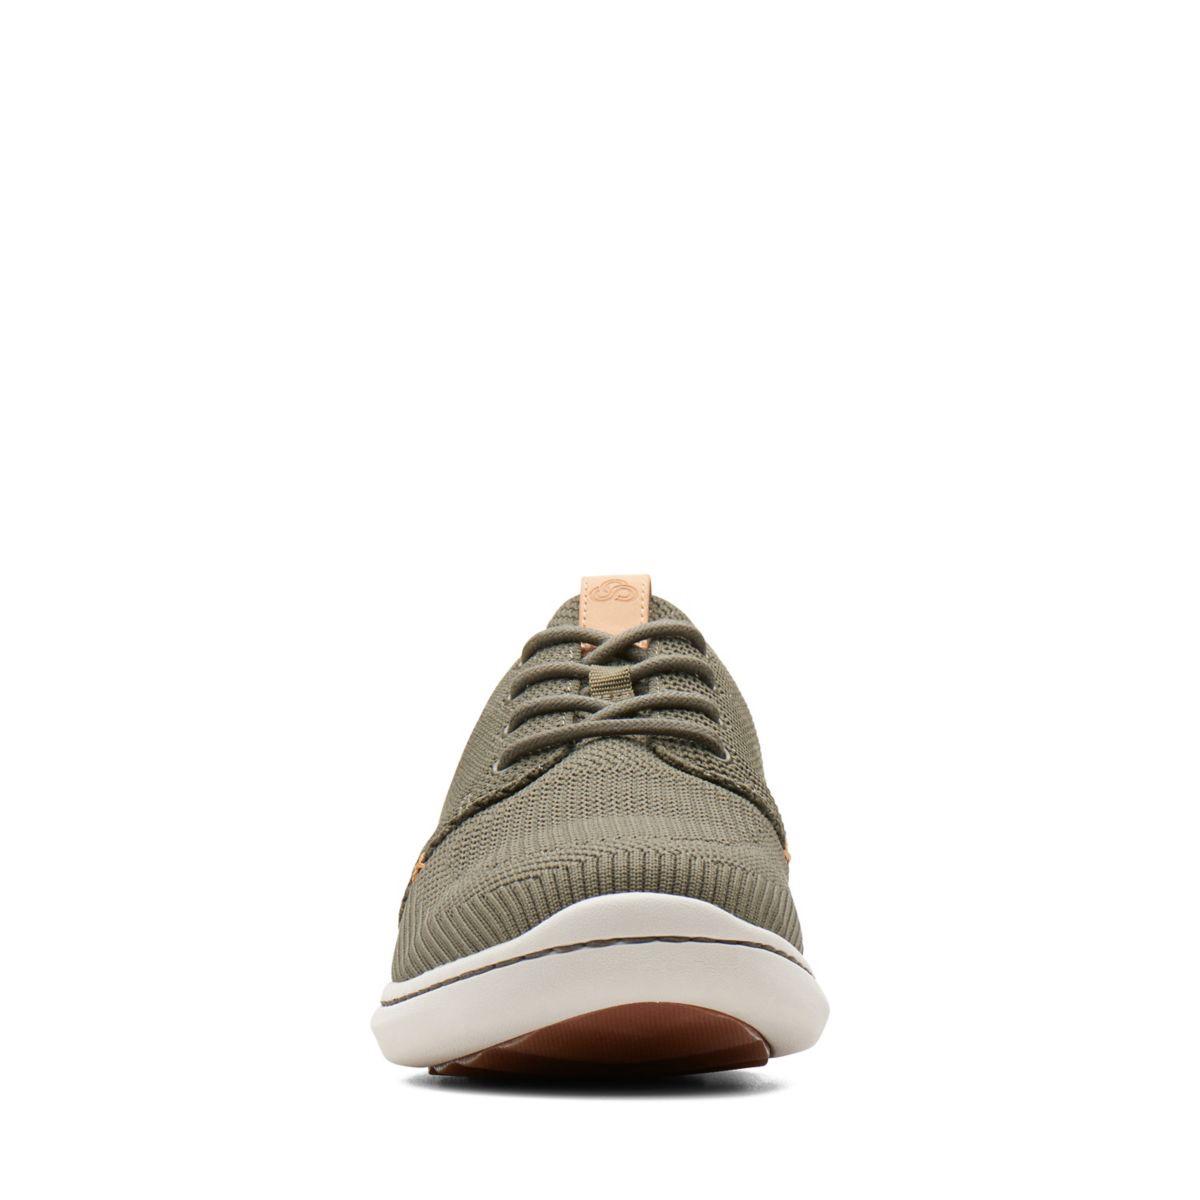 Step Urban Mix - Mens Shoes - Khaki by Clarks  64cb6b515